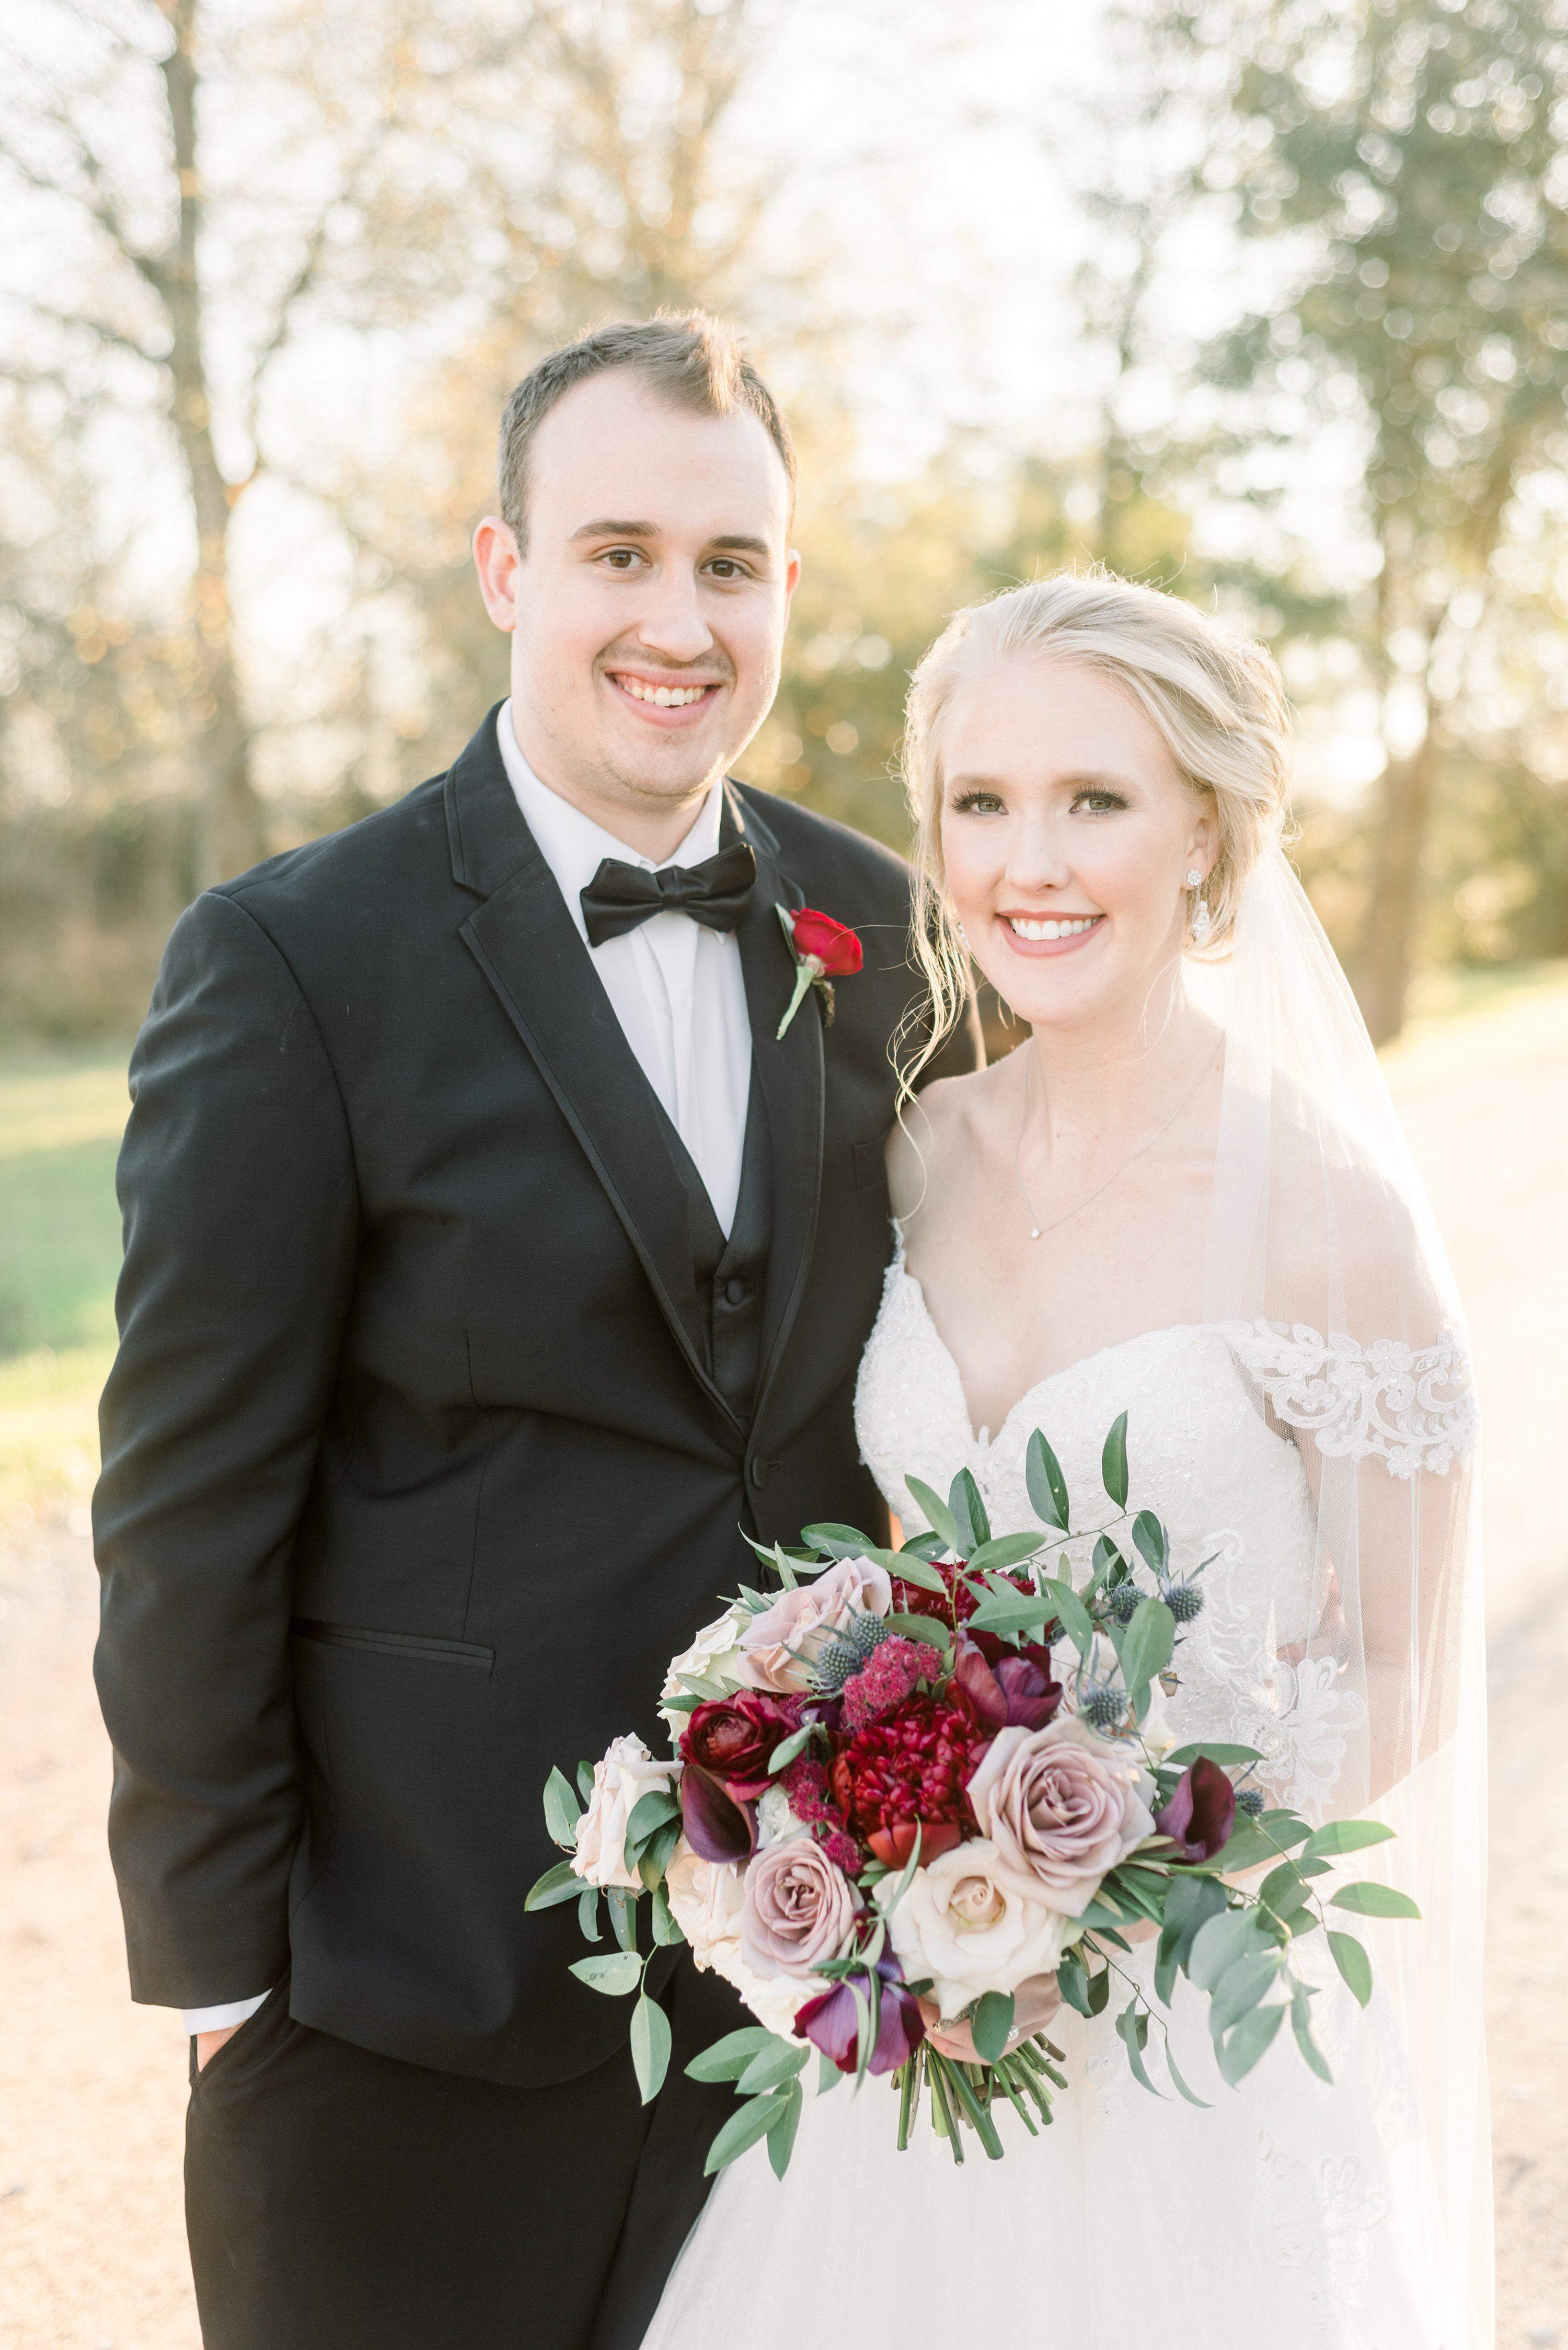 Houston Wedding Photographer,Houston Wedding Photography